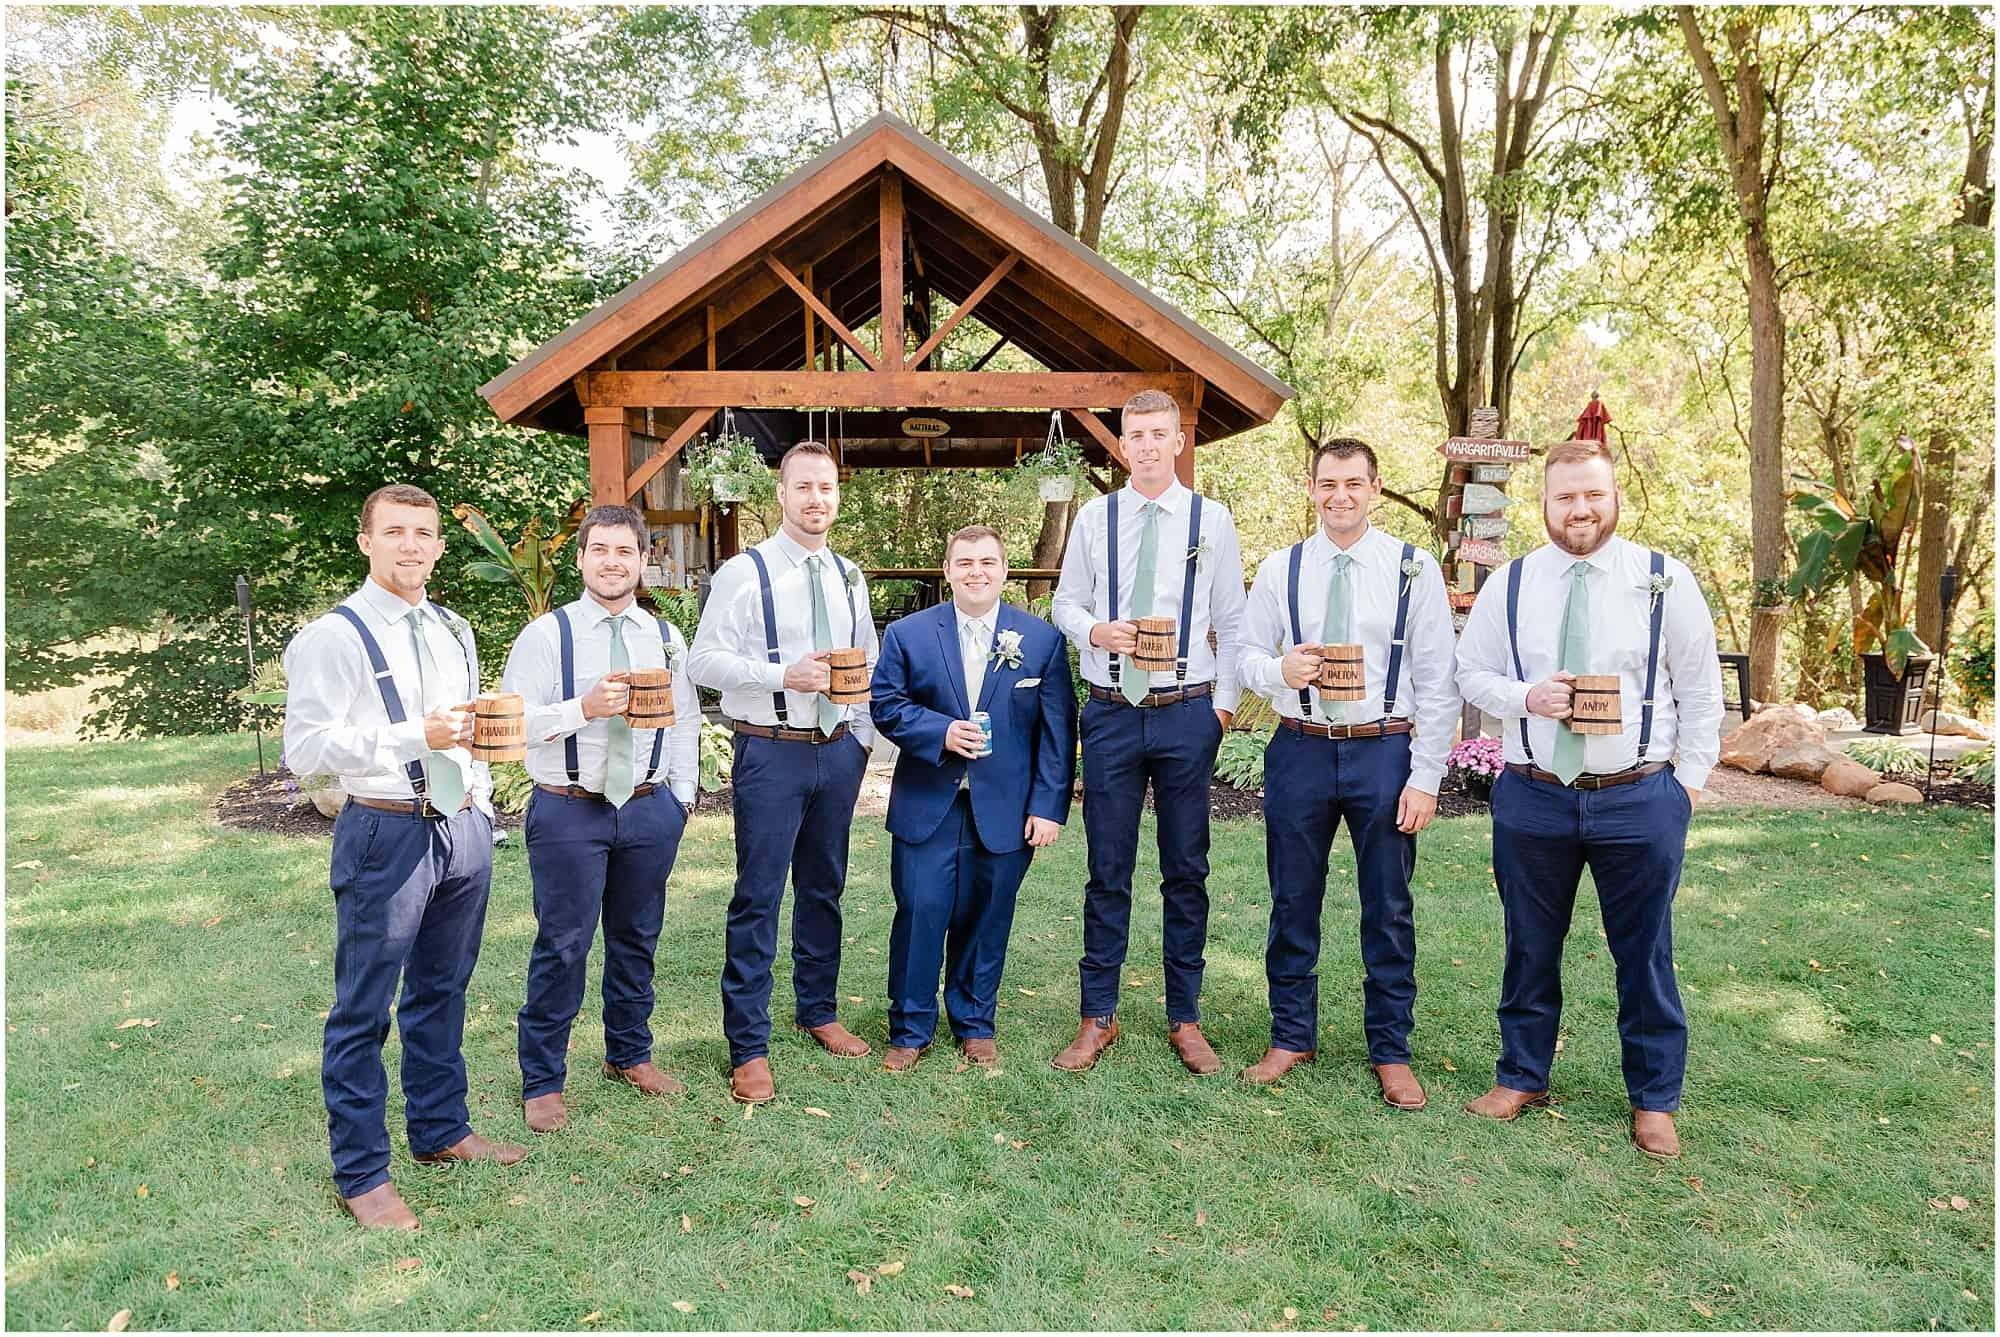 norwalk ohio wedding with groomsmen